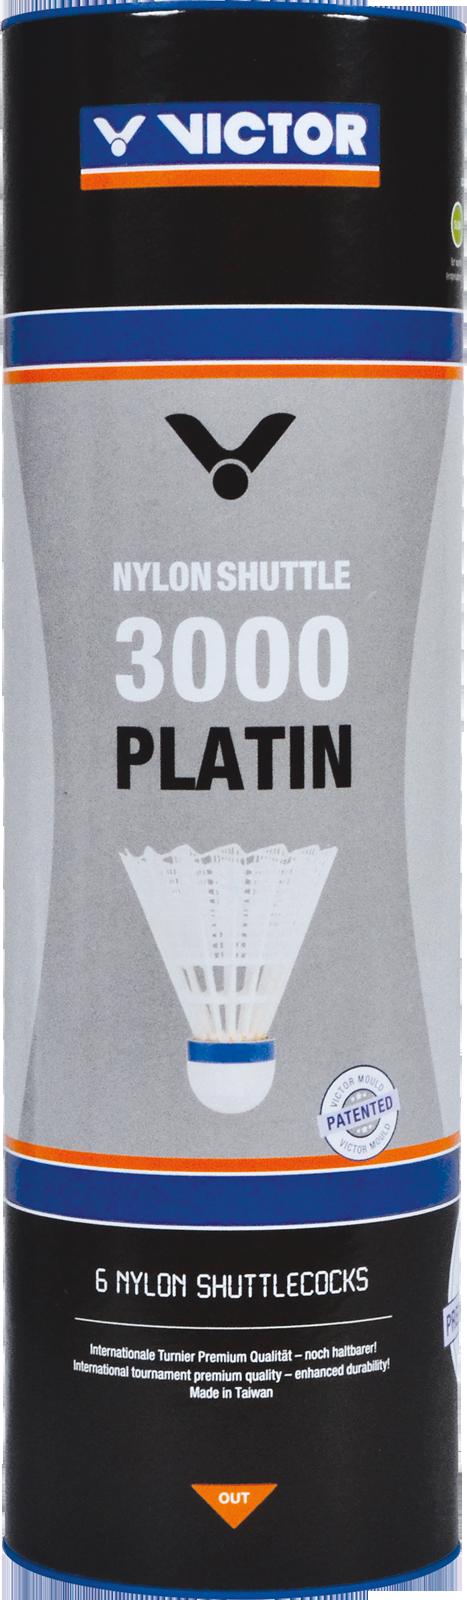 VICTOR Nylonshuttle 3000 medium/yellow